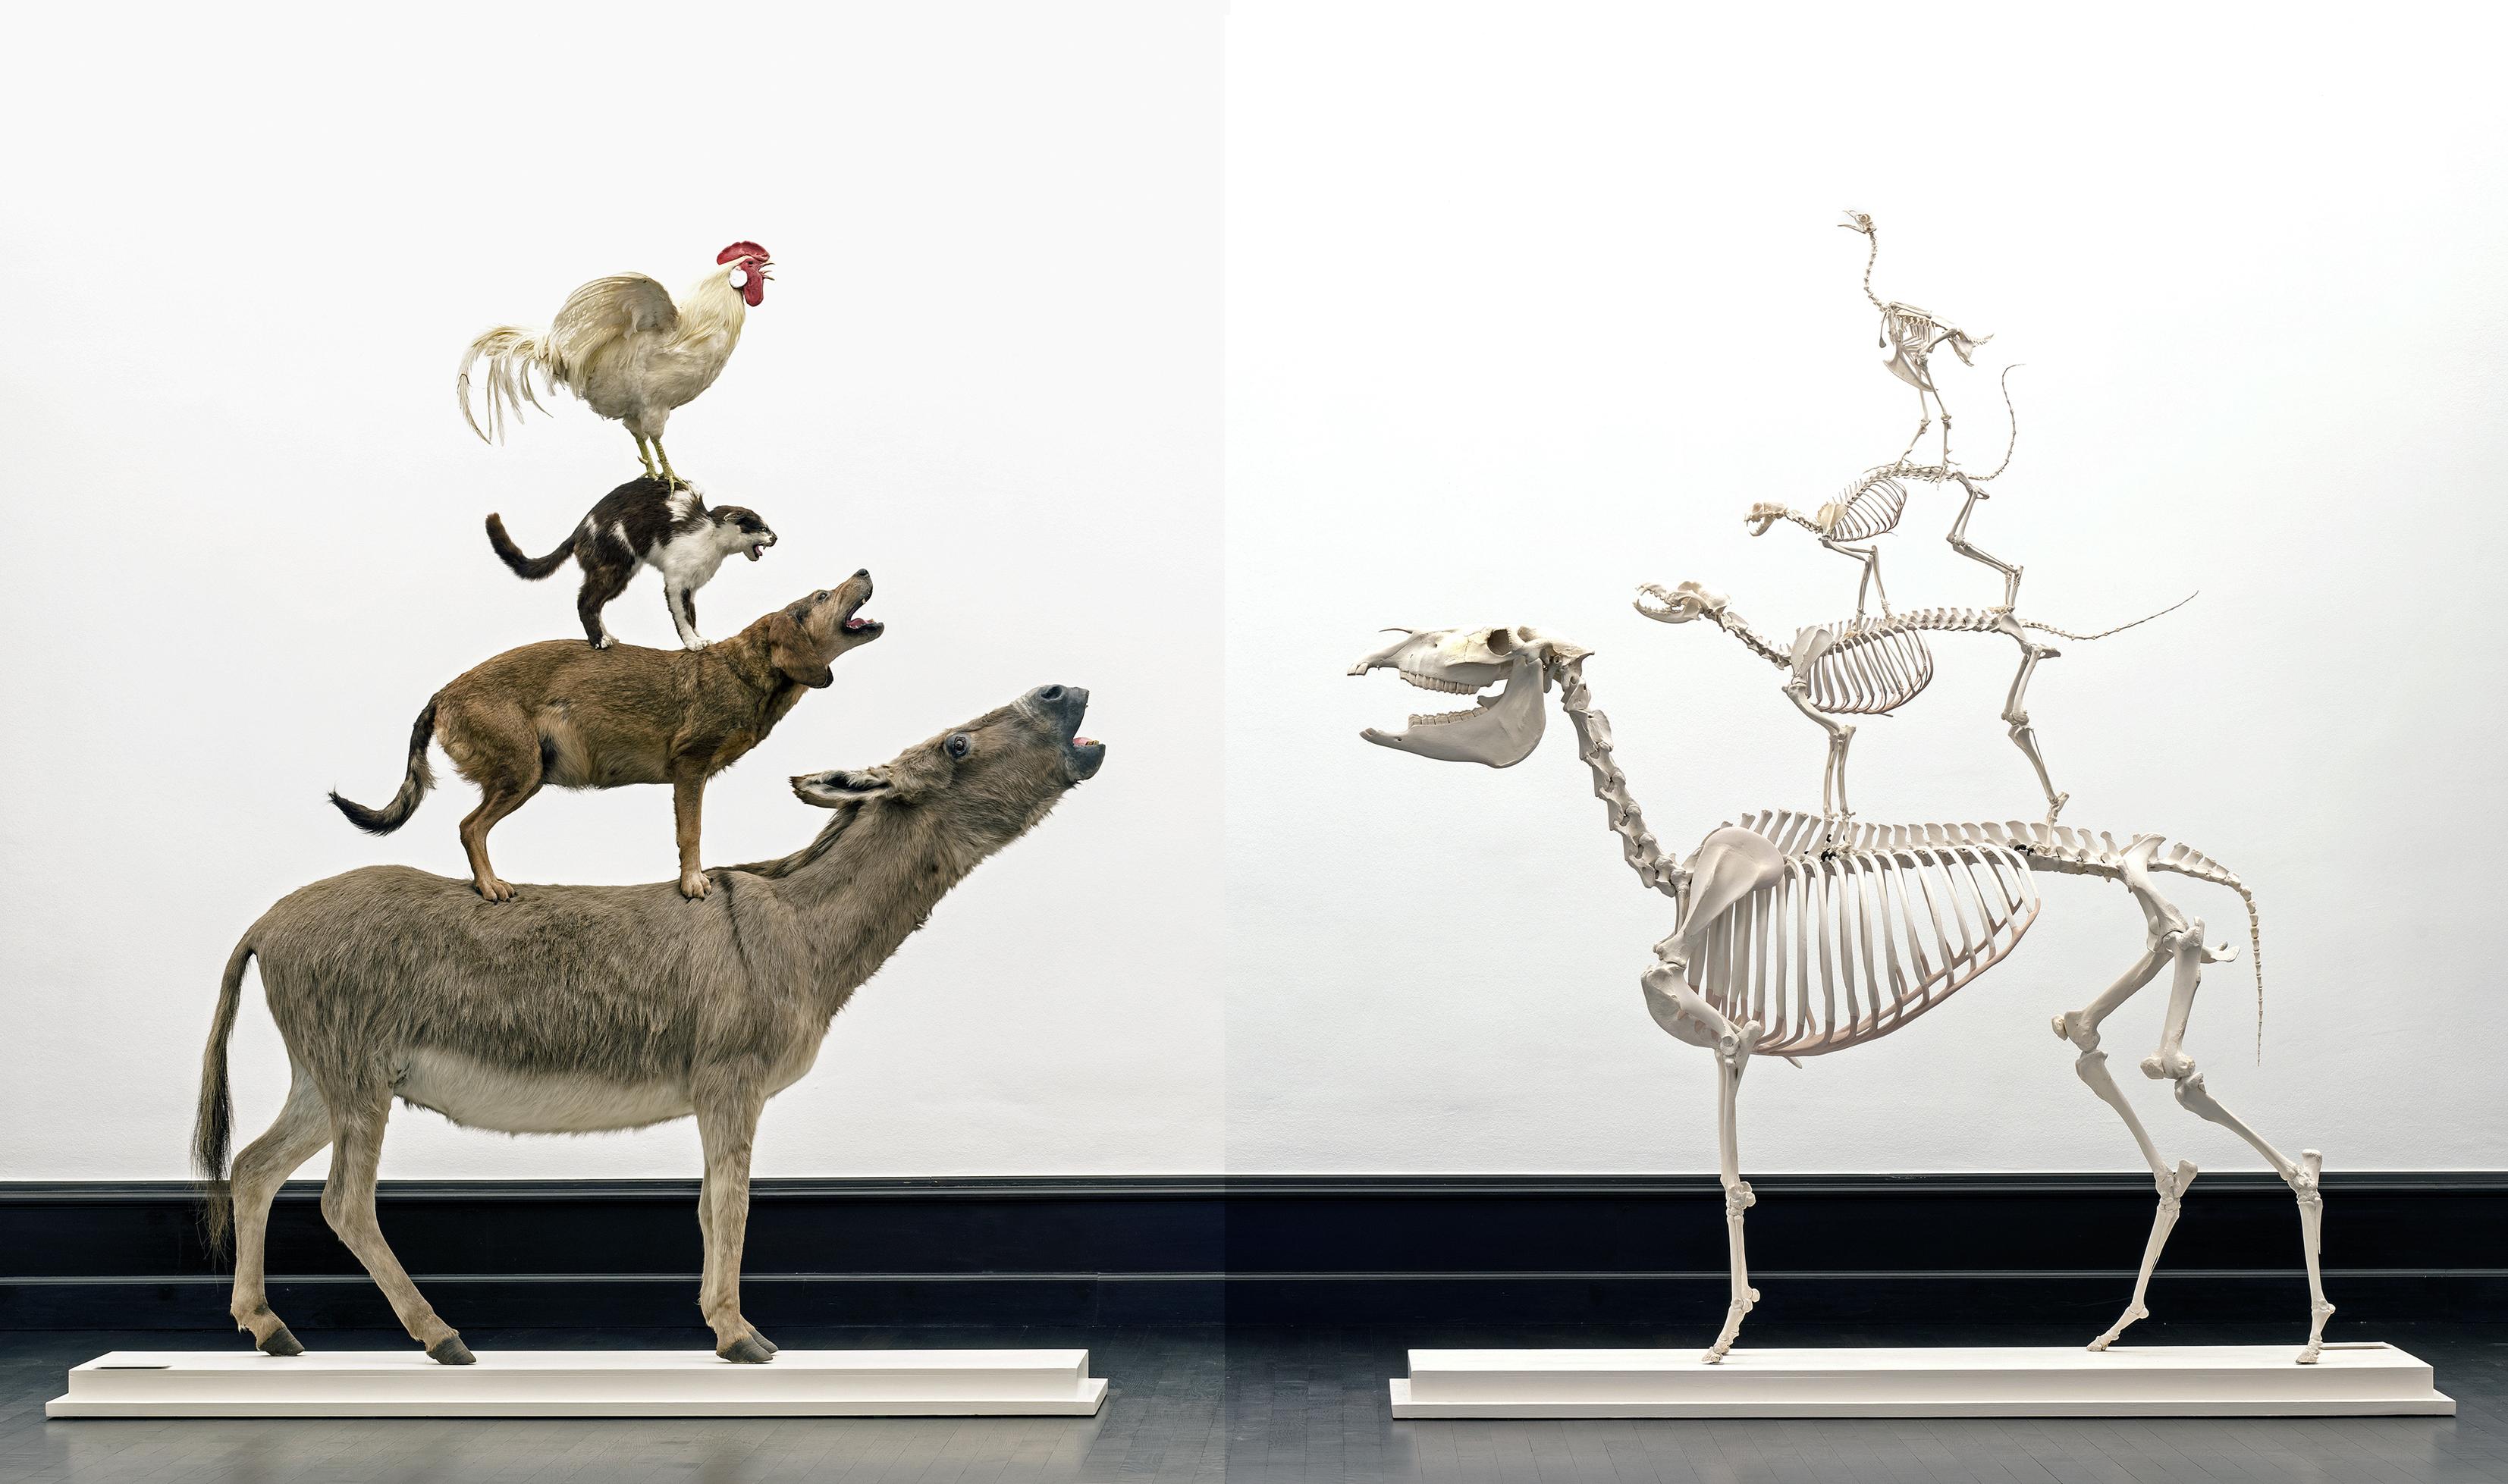 Maurizio Cattelan, Love Saves Life, 1995 und Love Lasts Forever, 1998 Tierpräparate, Tierskelette Kunsthalle Bremen – Der Kunstverein in Bremen © Maurizio Cattelan